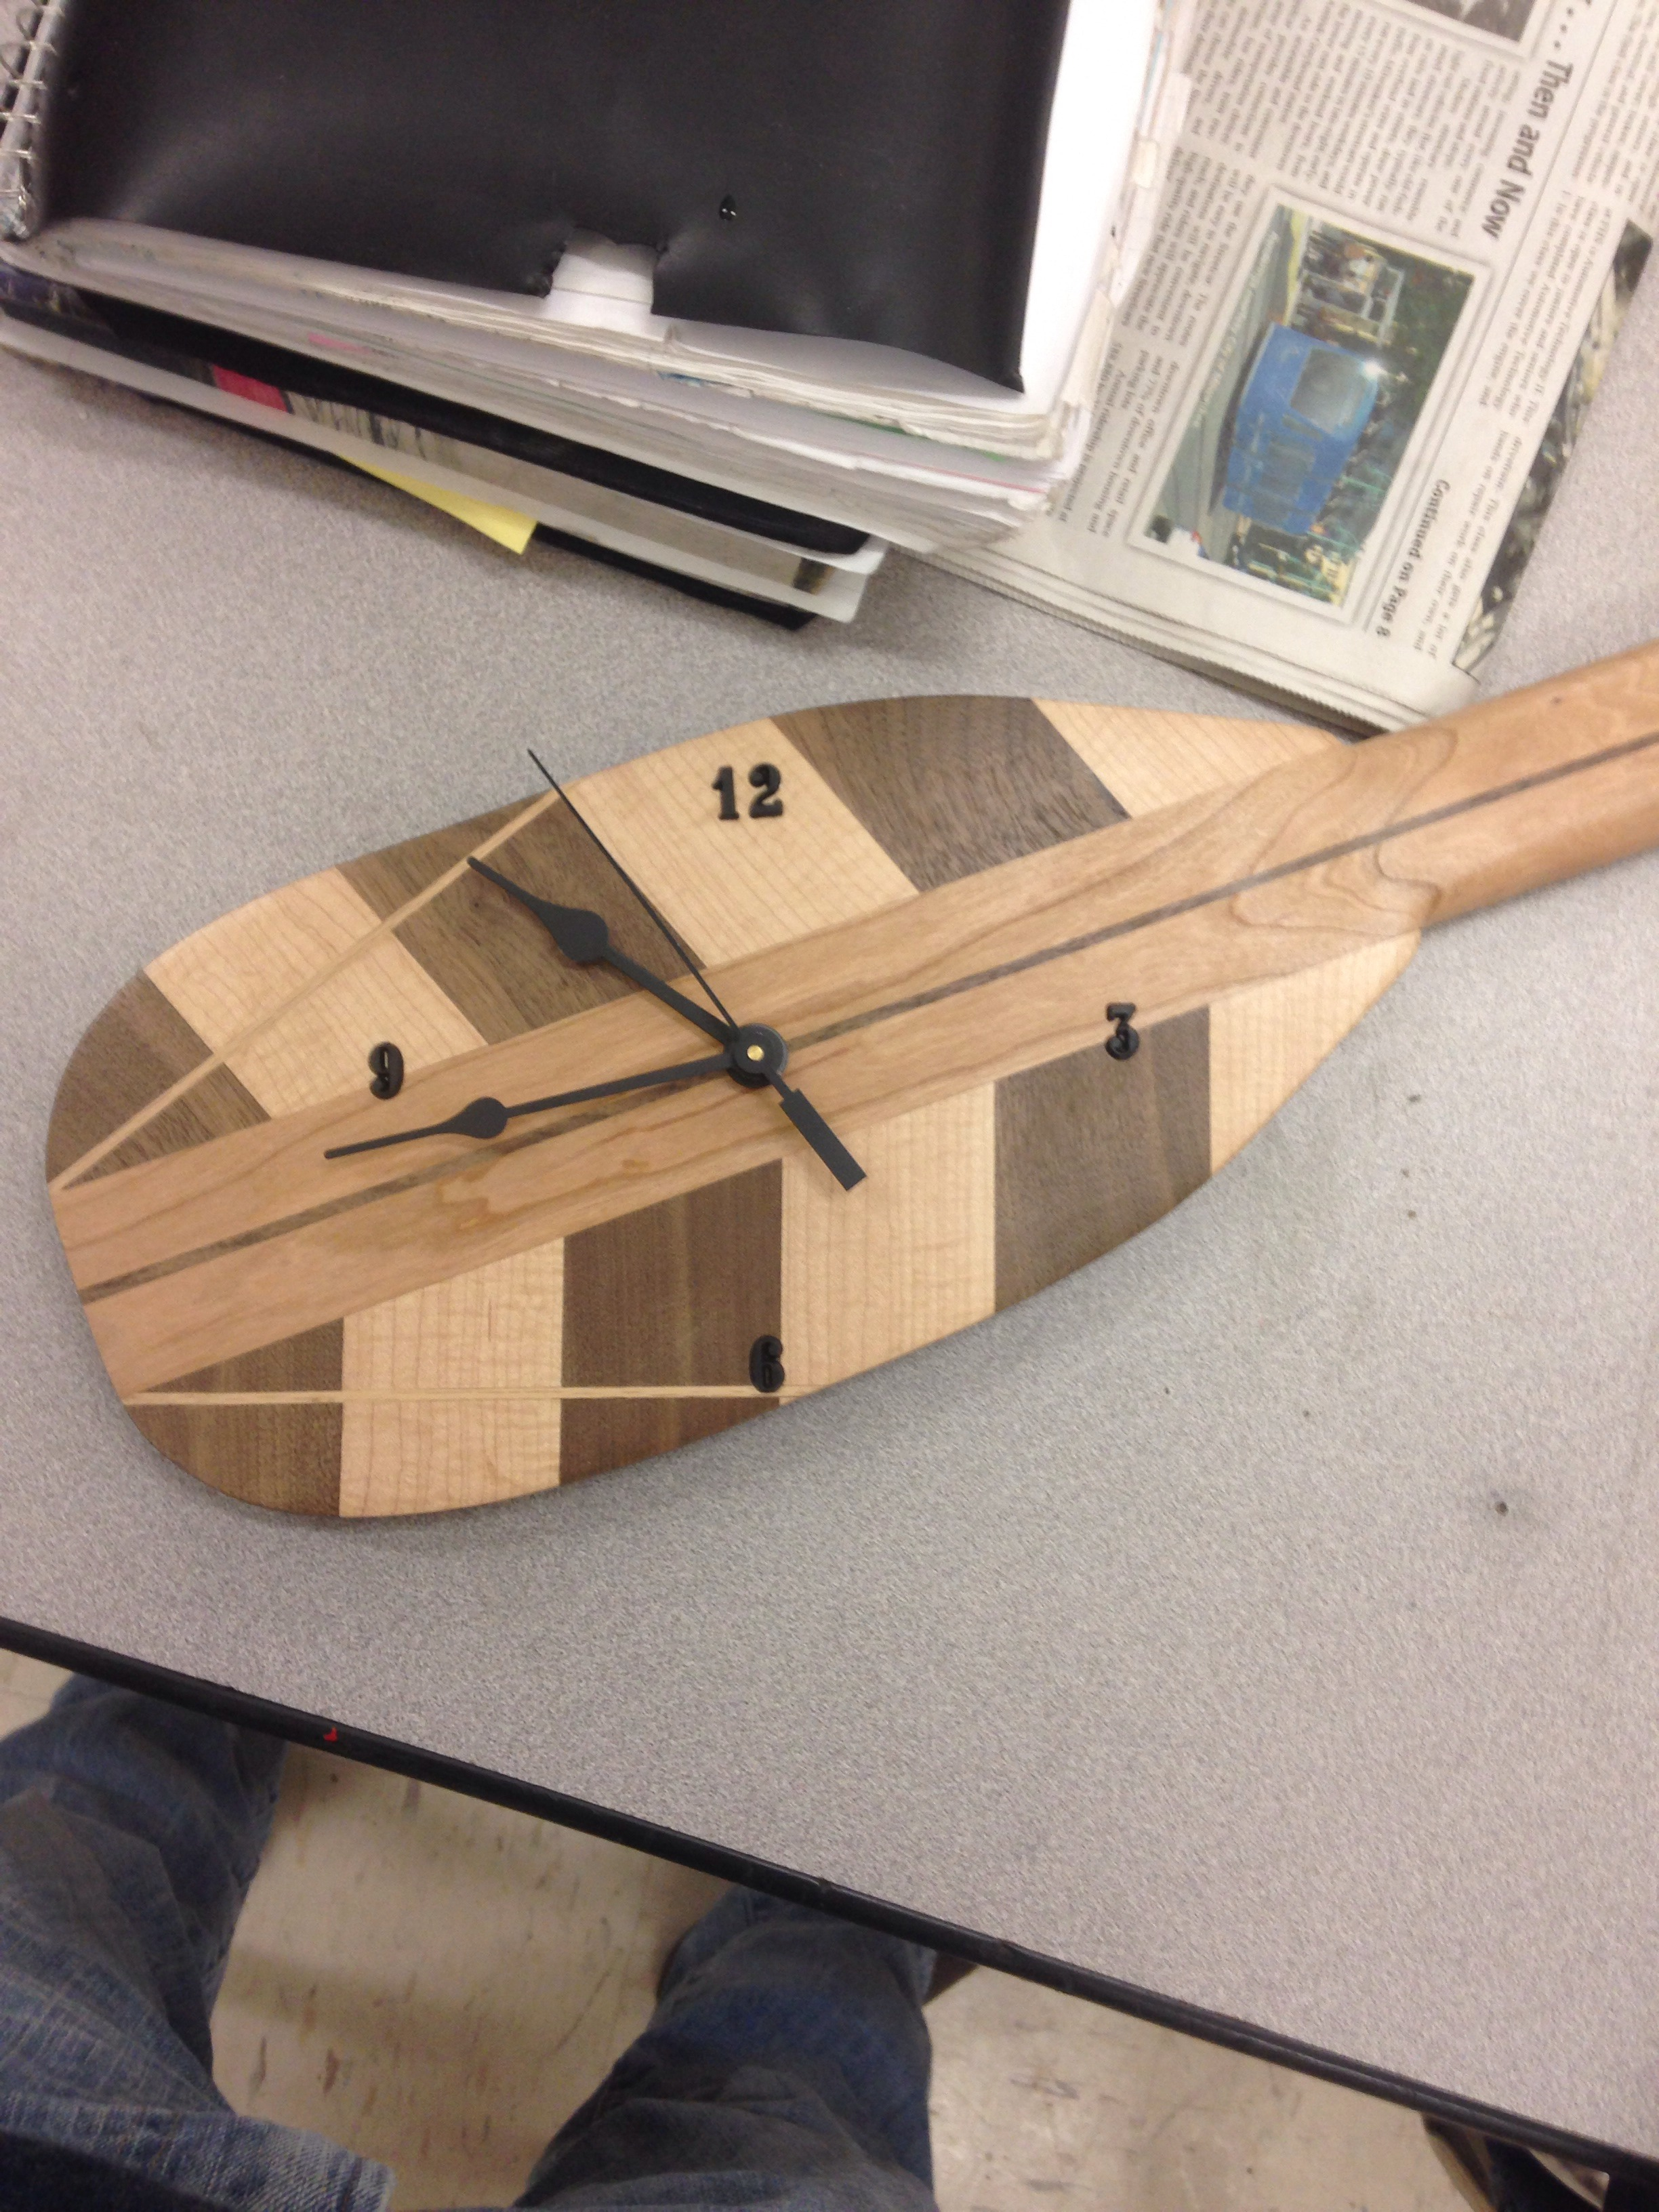 Canoe Paddle Clock